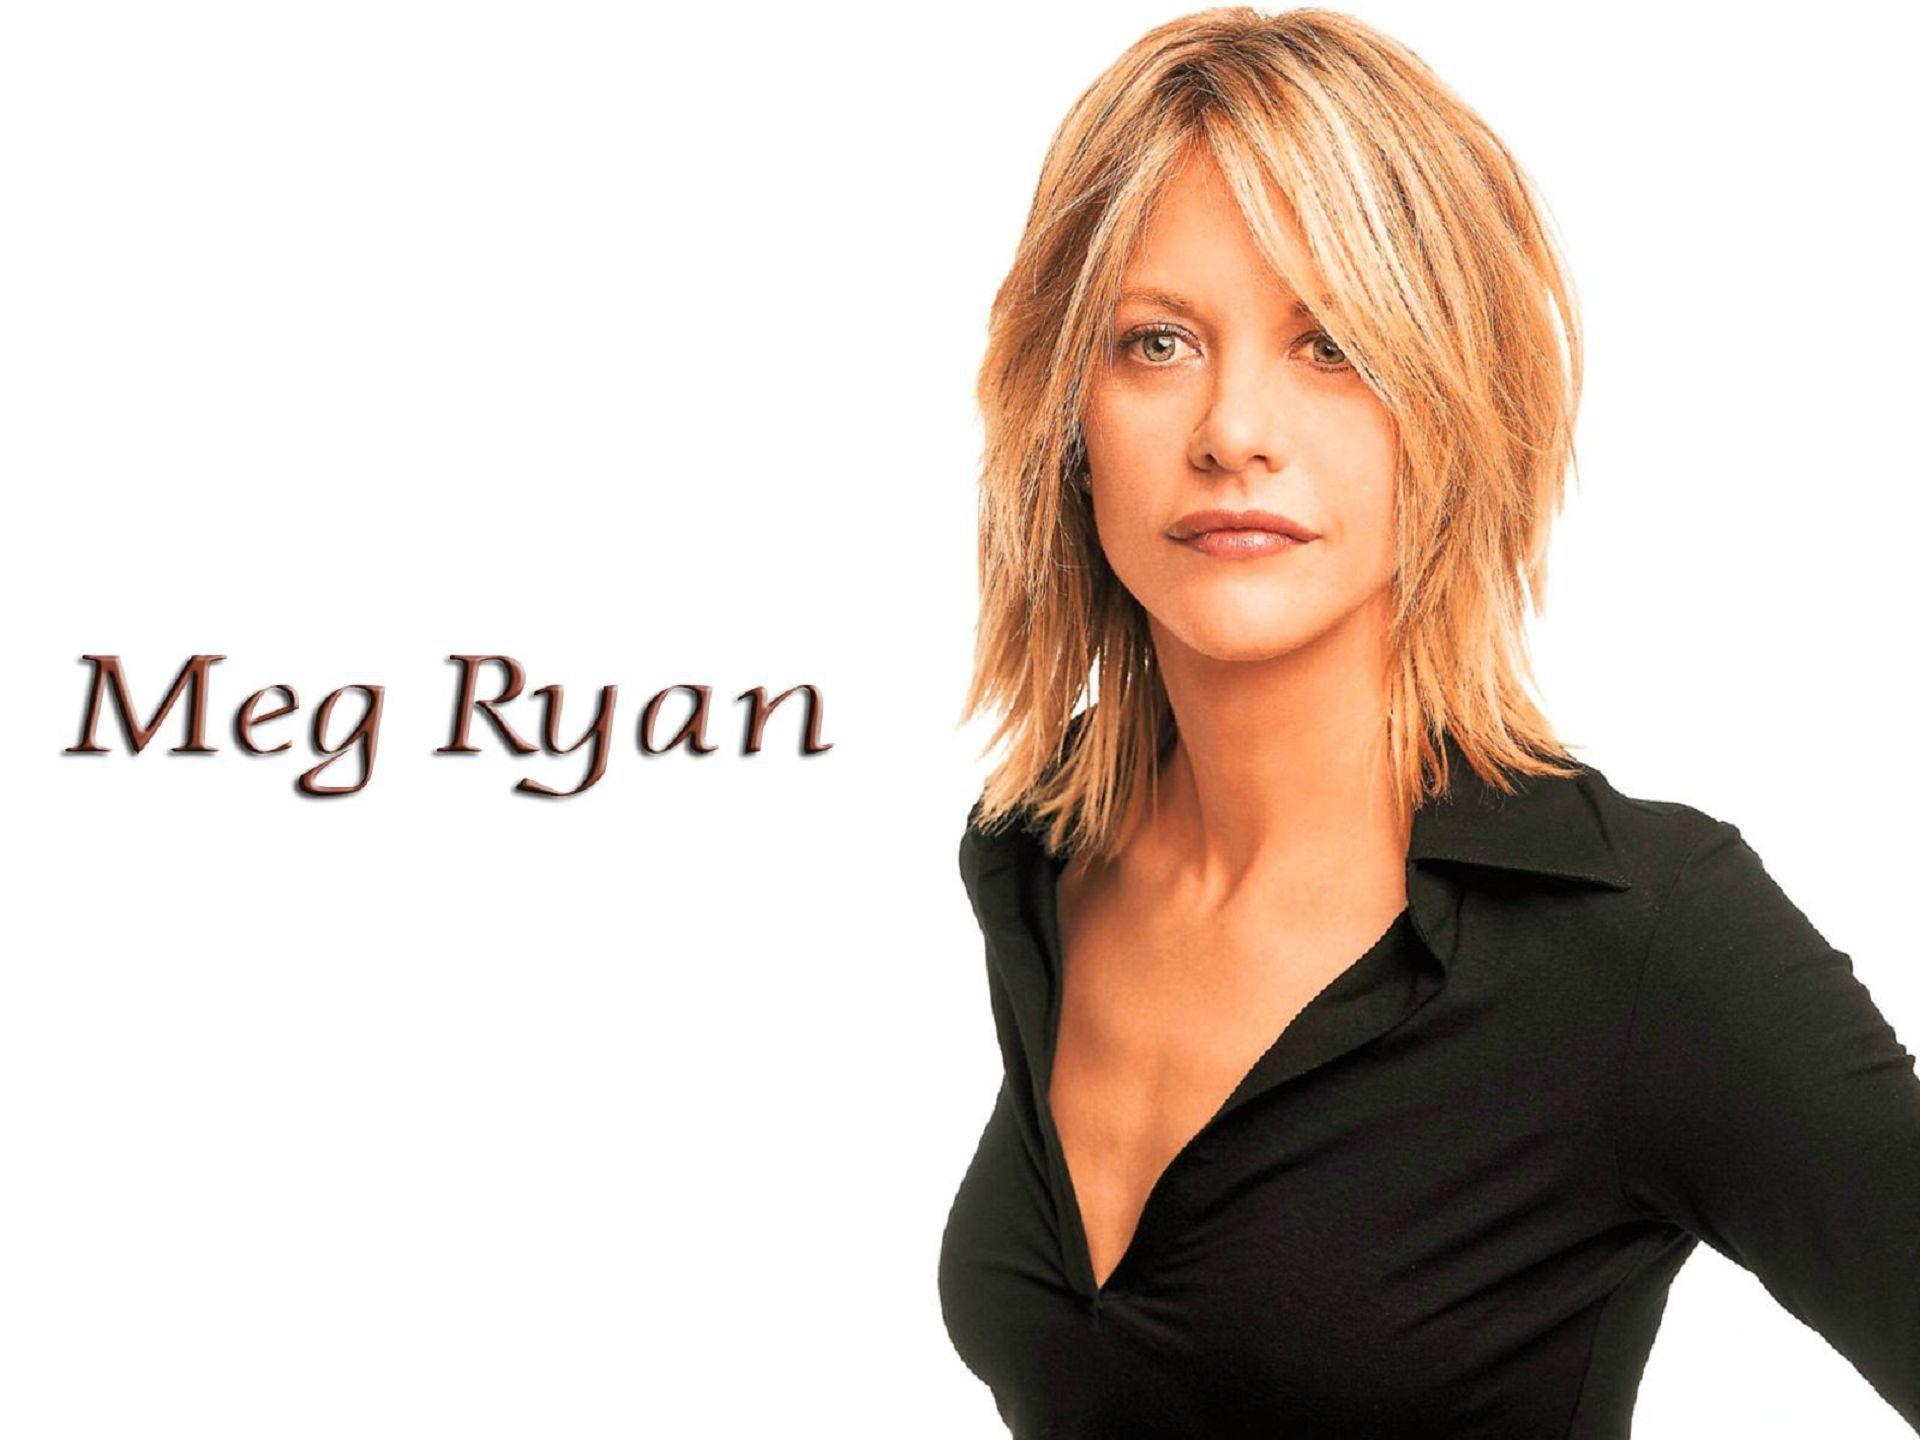 Meg Ryan Wallpapers Hd